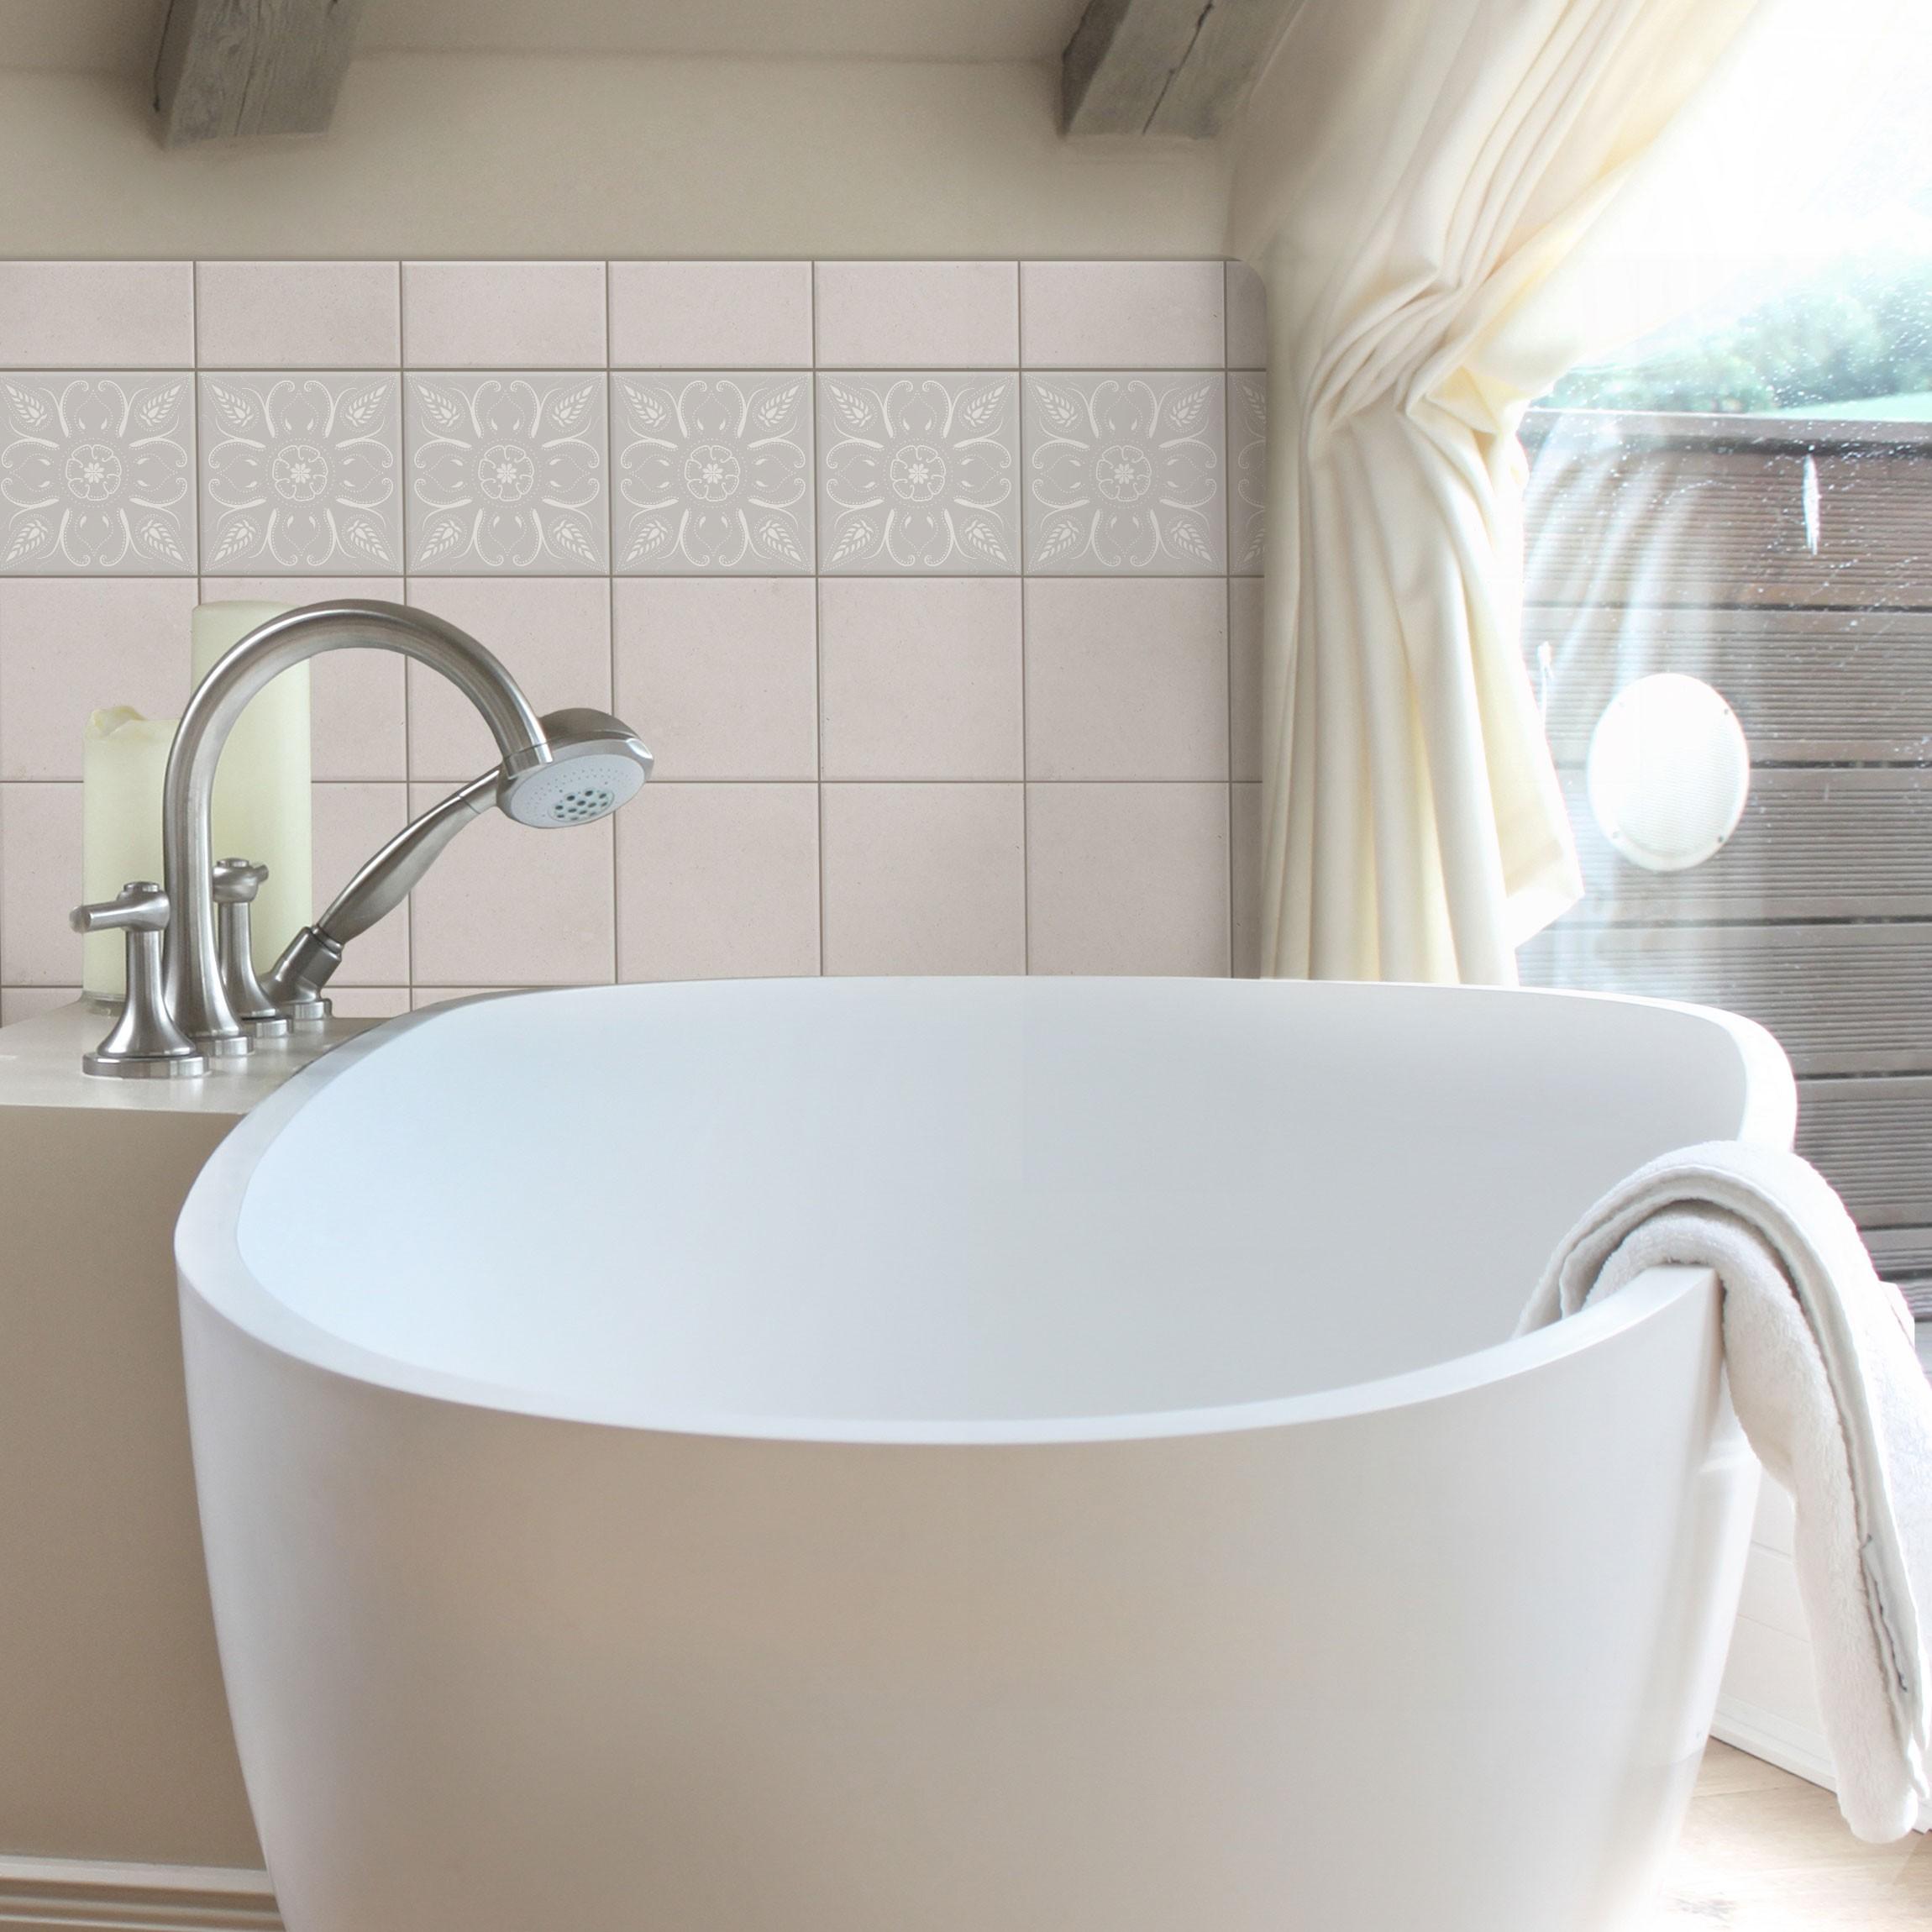 fliesen bord re bandana light grey 20x20 cm fliesenaufkleber grau. Black Bedroom Furniture Sets. Home Design Ideas